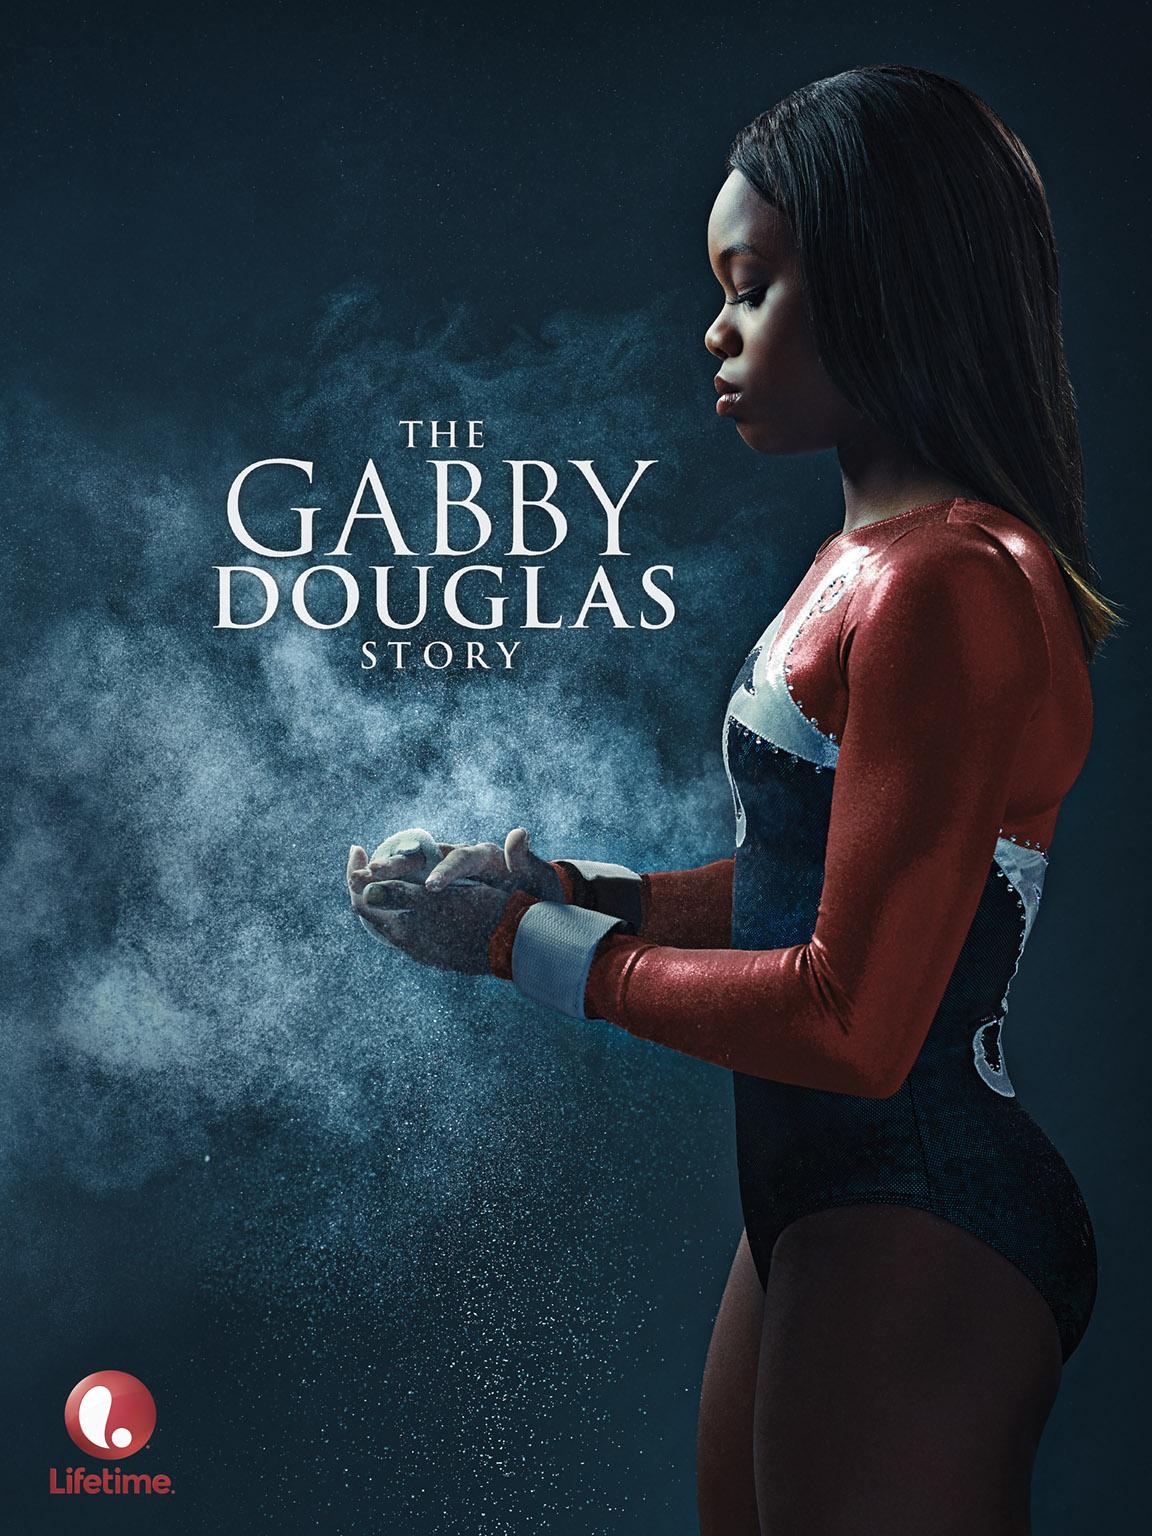 The Gabby Douglas Story Joey L Patricia McMahon 1152x1536